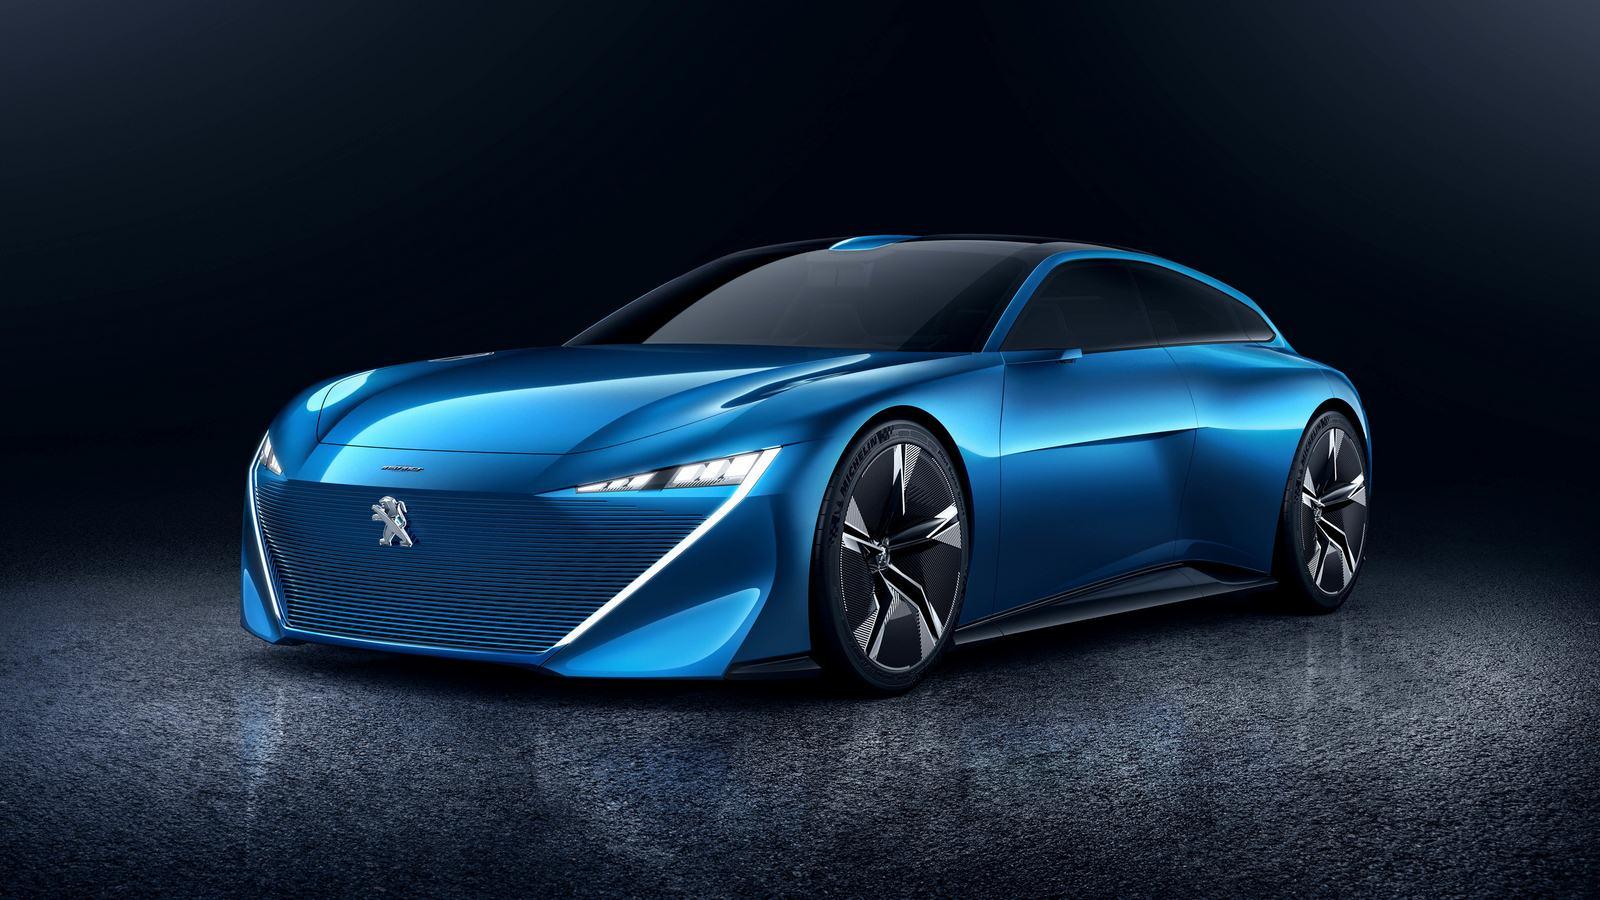 2017-Peugeot-Instinct-Concept-01